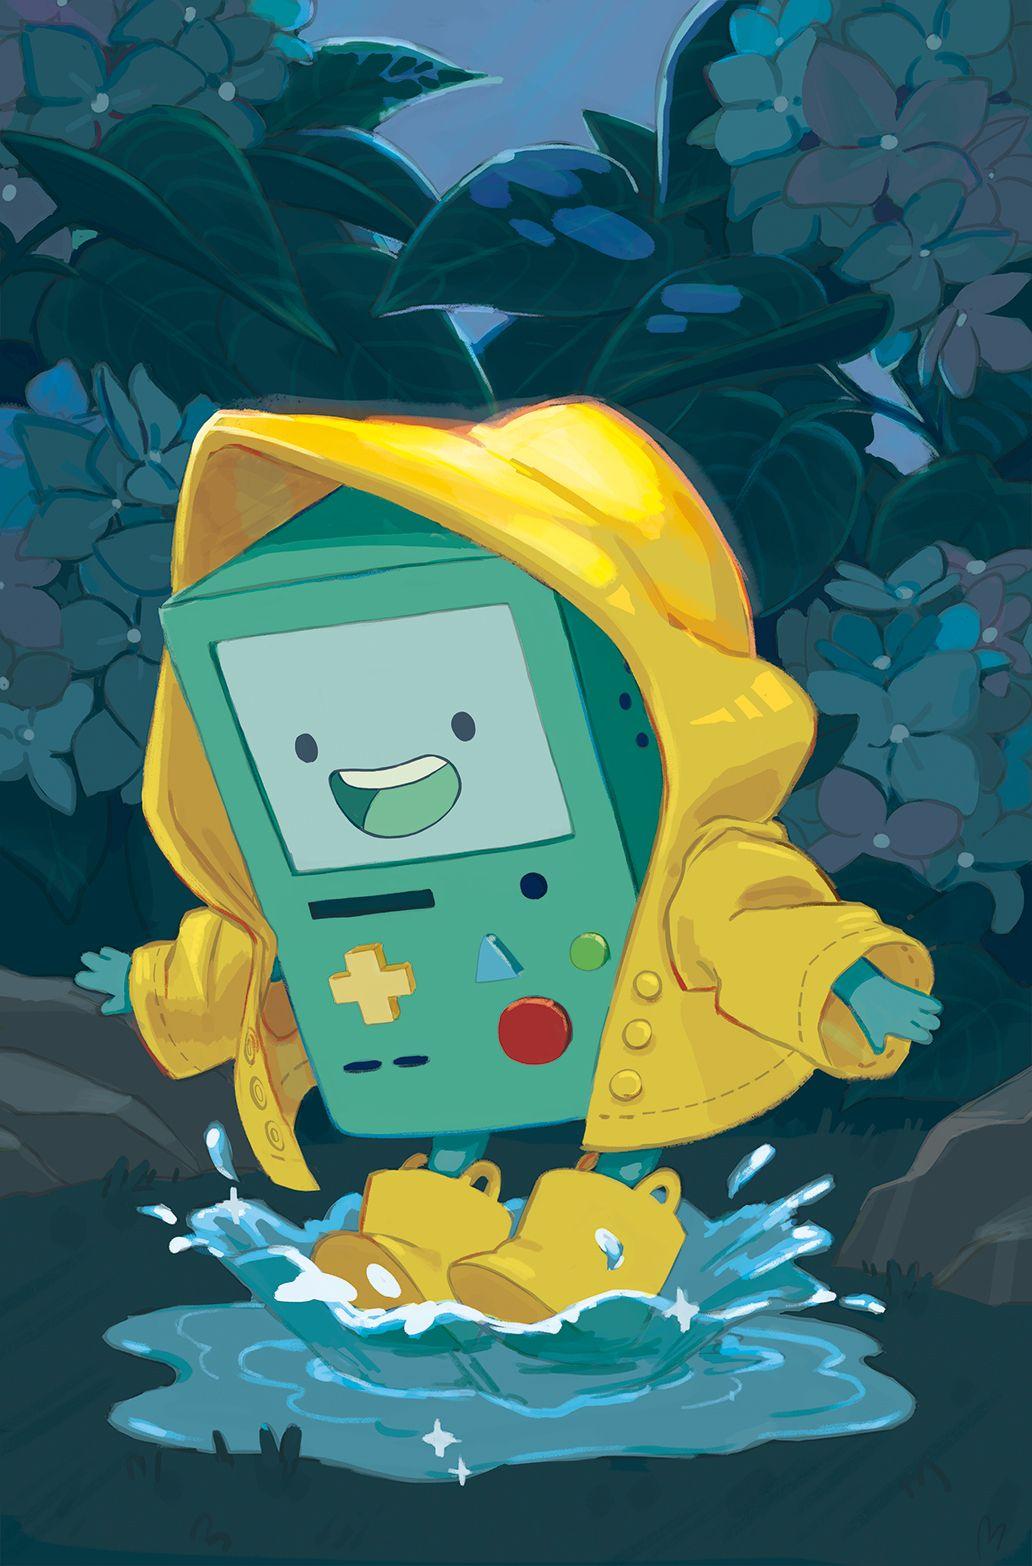 Adventure Time 57 Adventure Time Anime Adventure Time Wallpaper Adventure Time